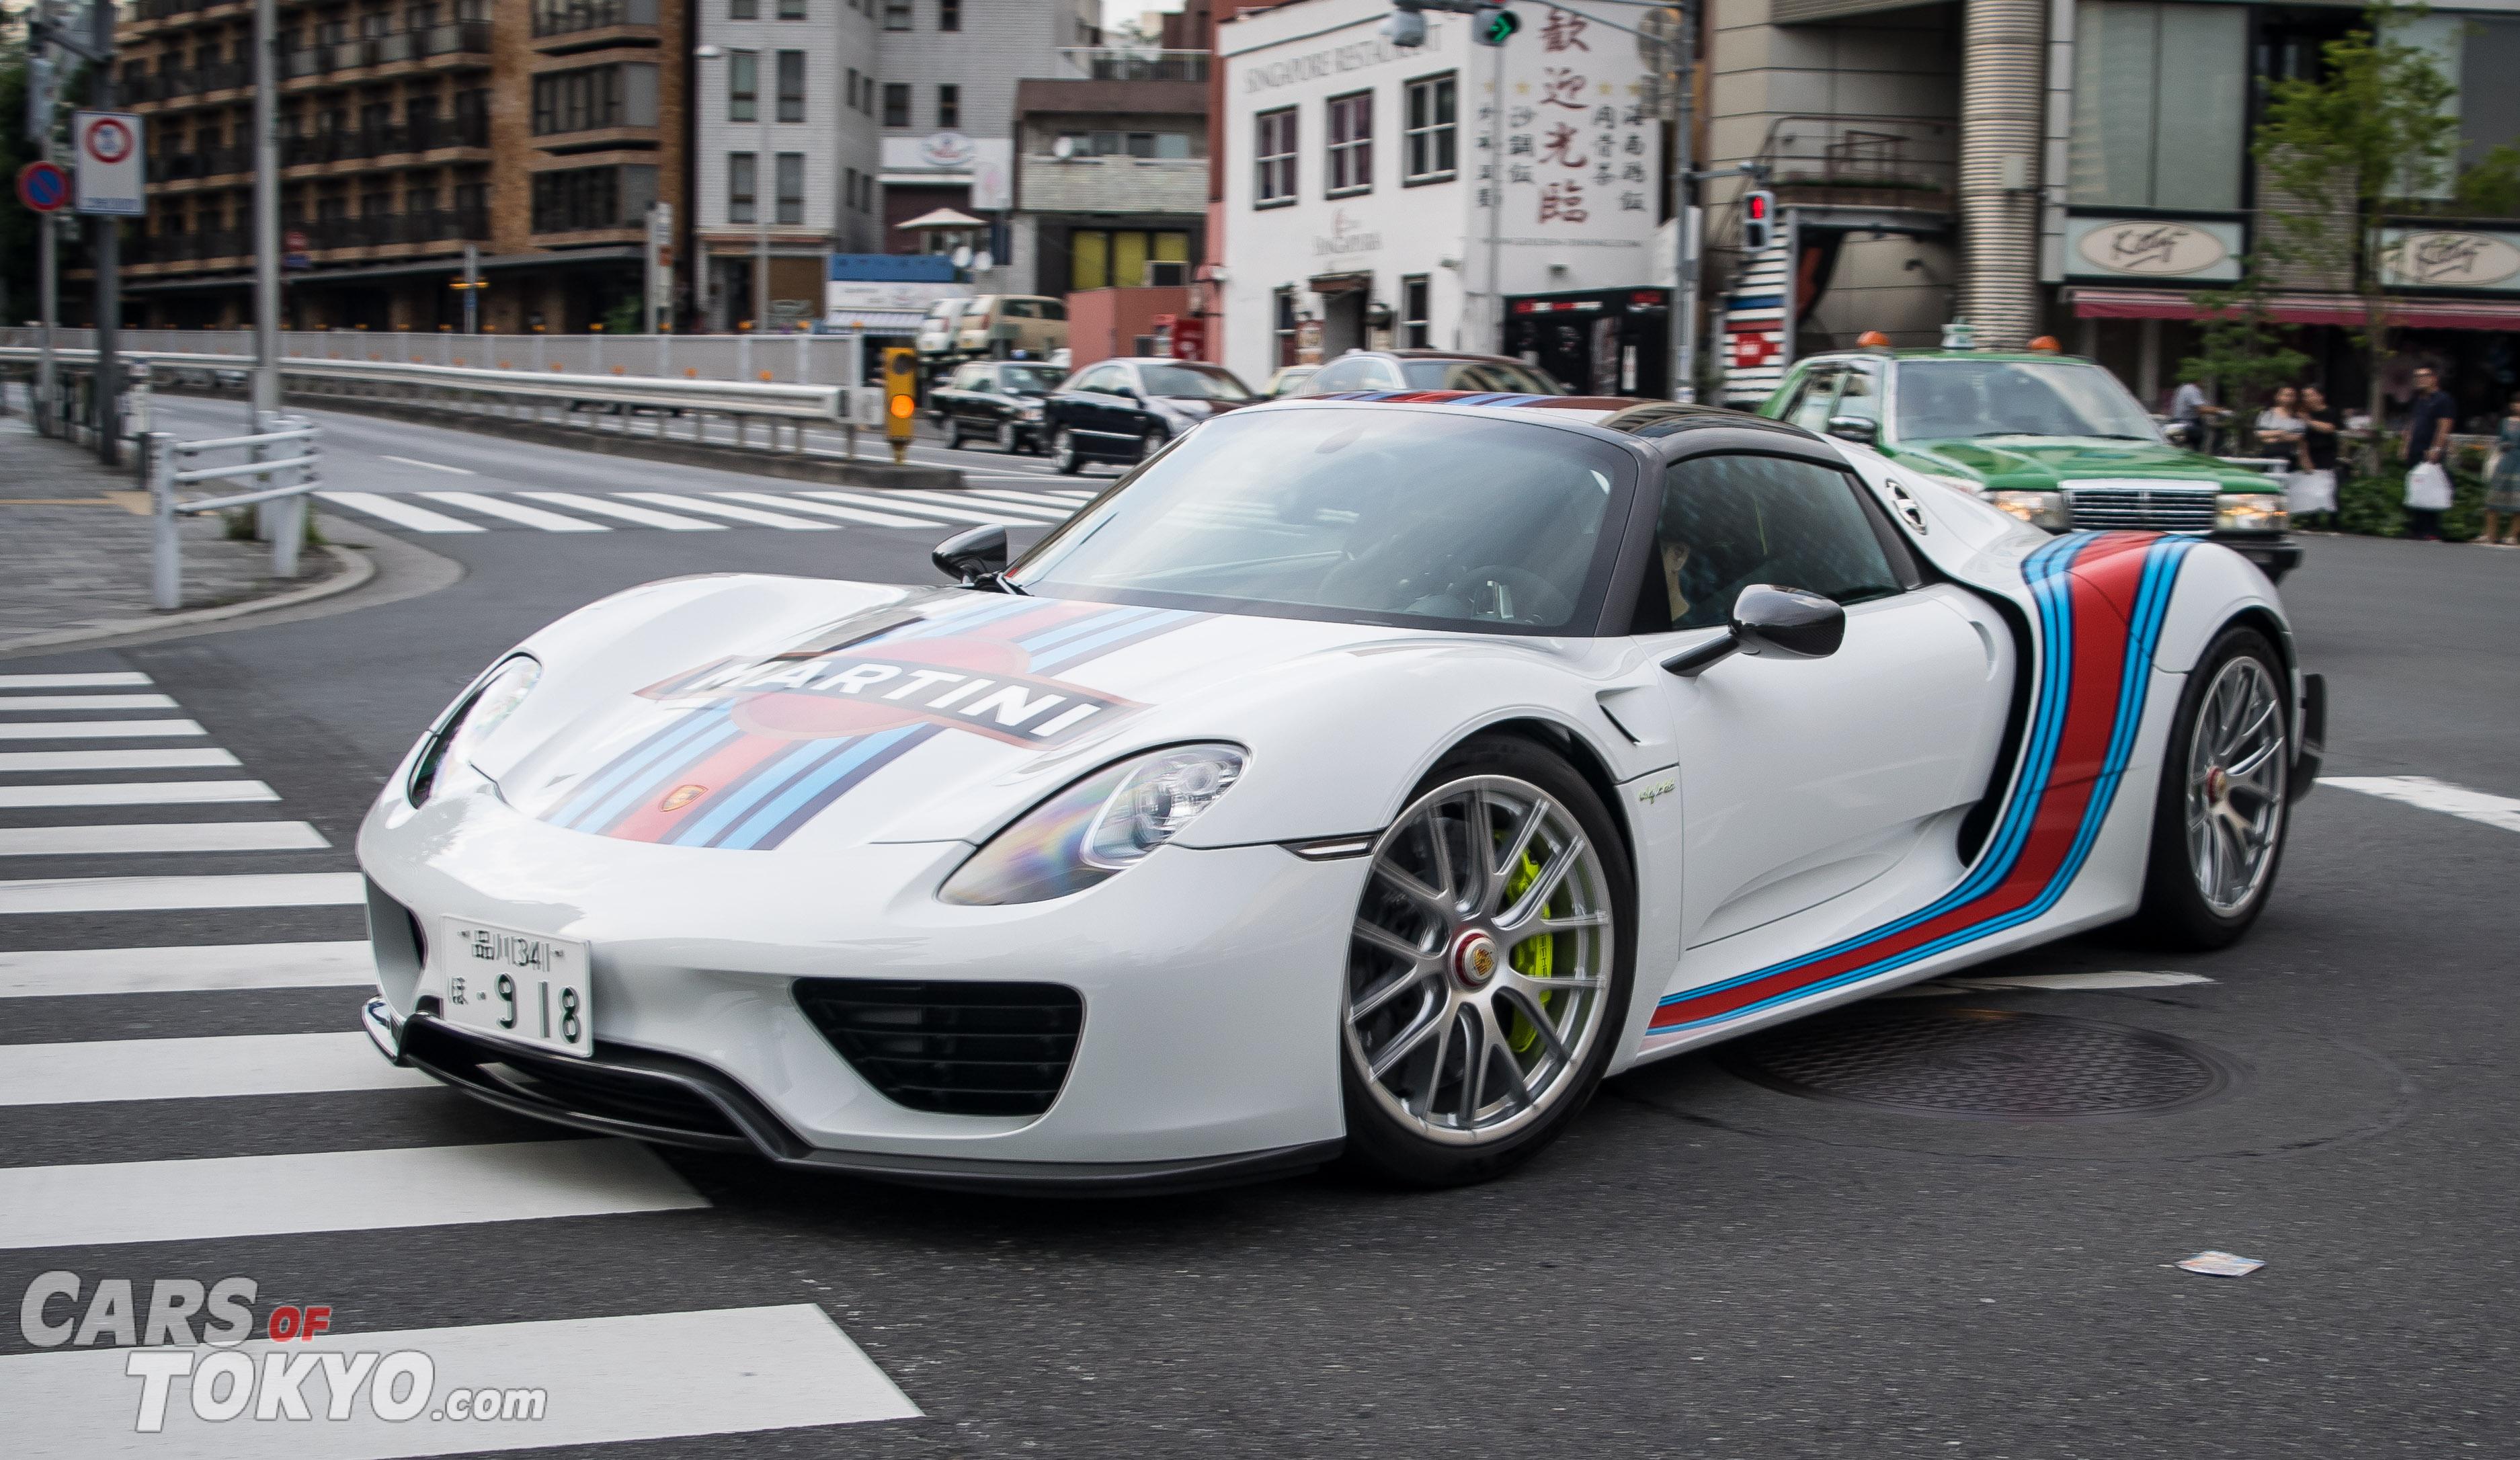 Cars of Tokyo Roppongi Porsche 918 Spyder